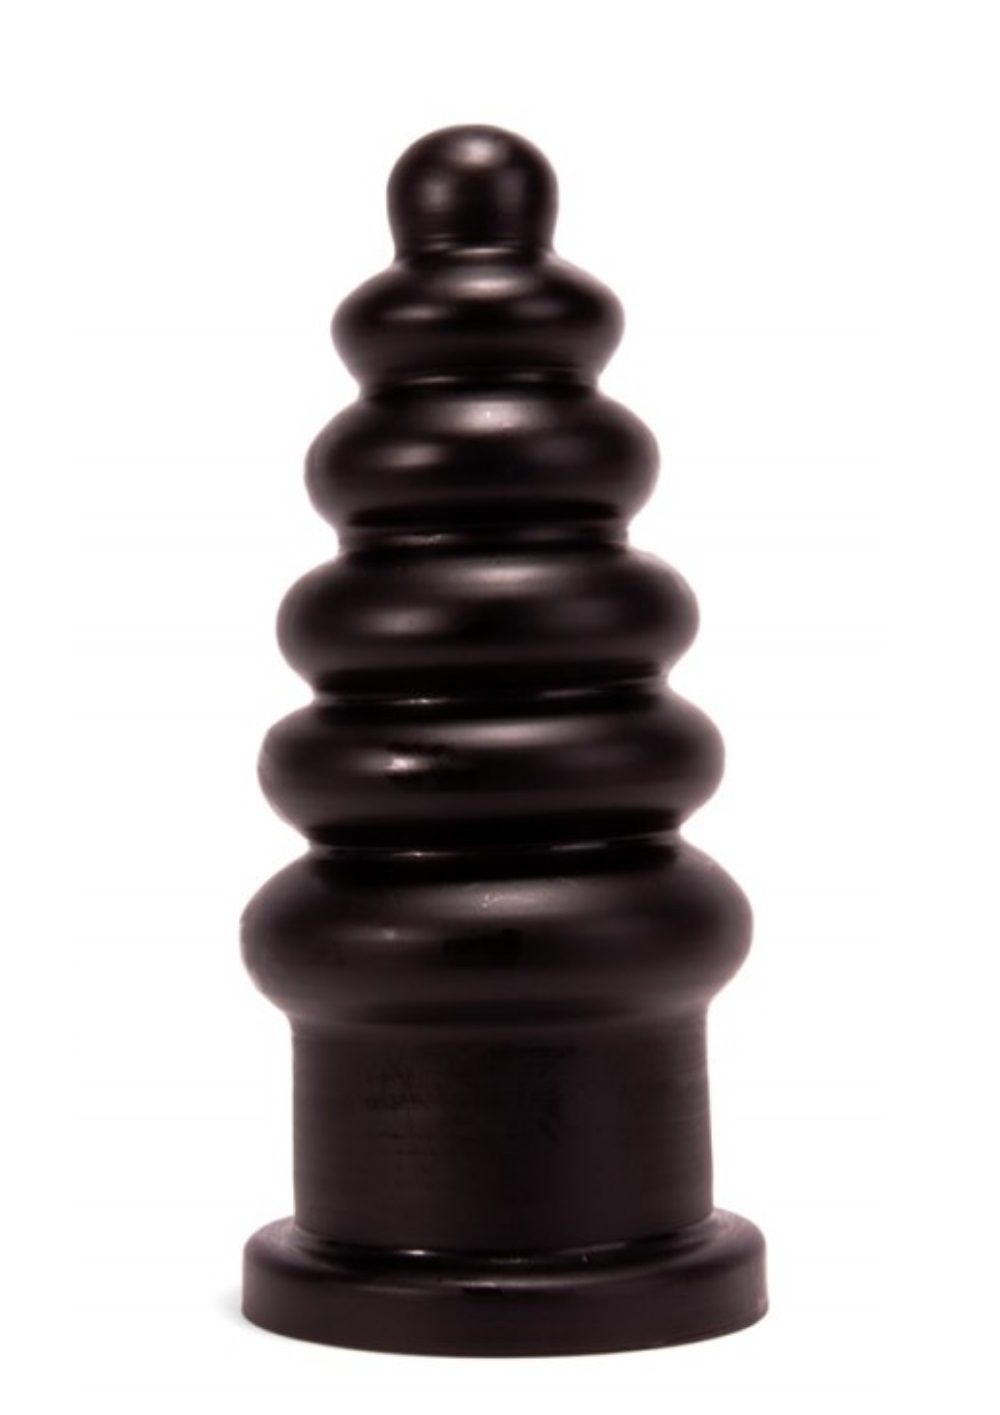 Butt plug bordás,23cm-fekete.